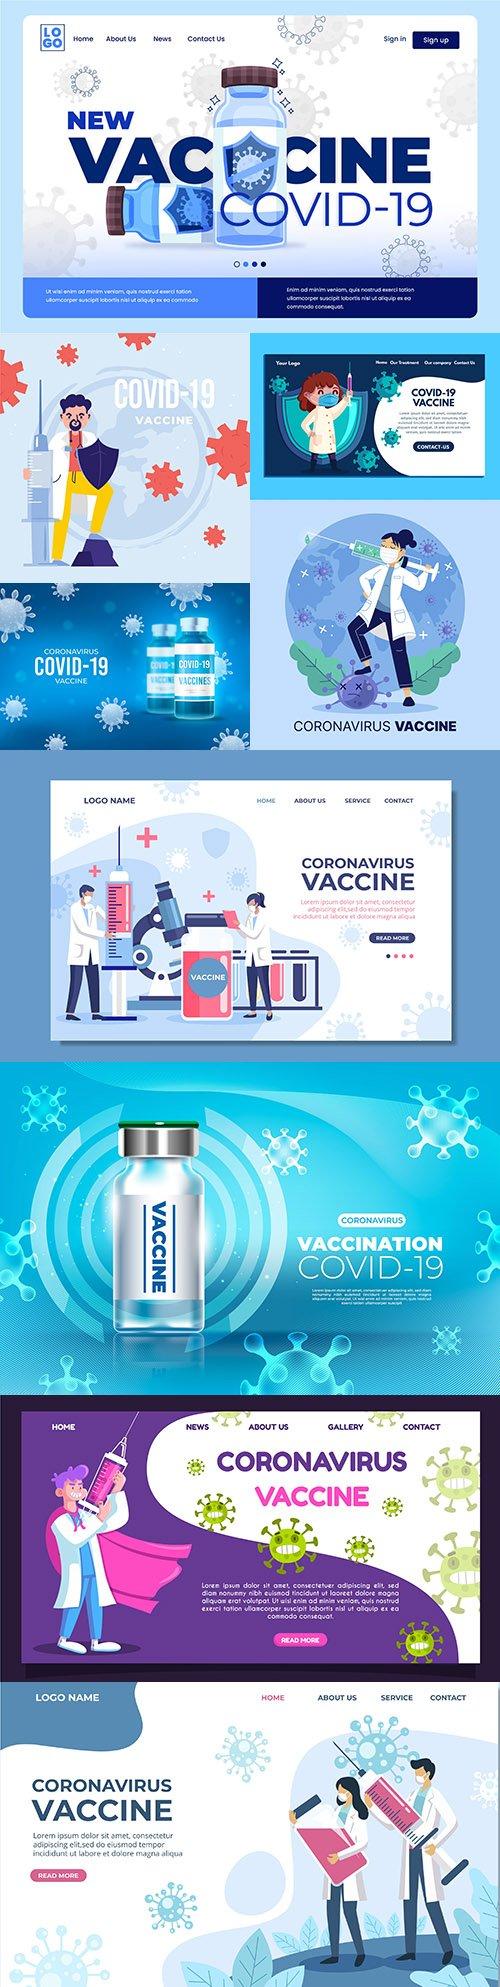 Coronavirus vaccine design illustration landing page